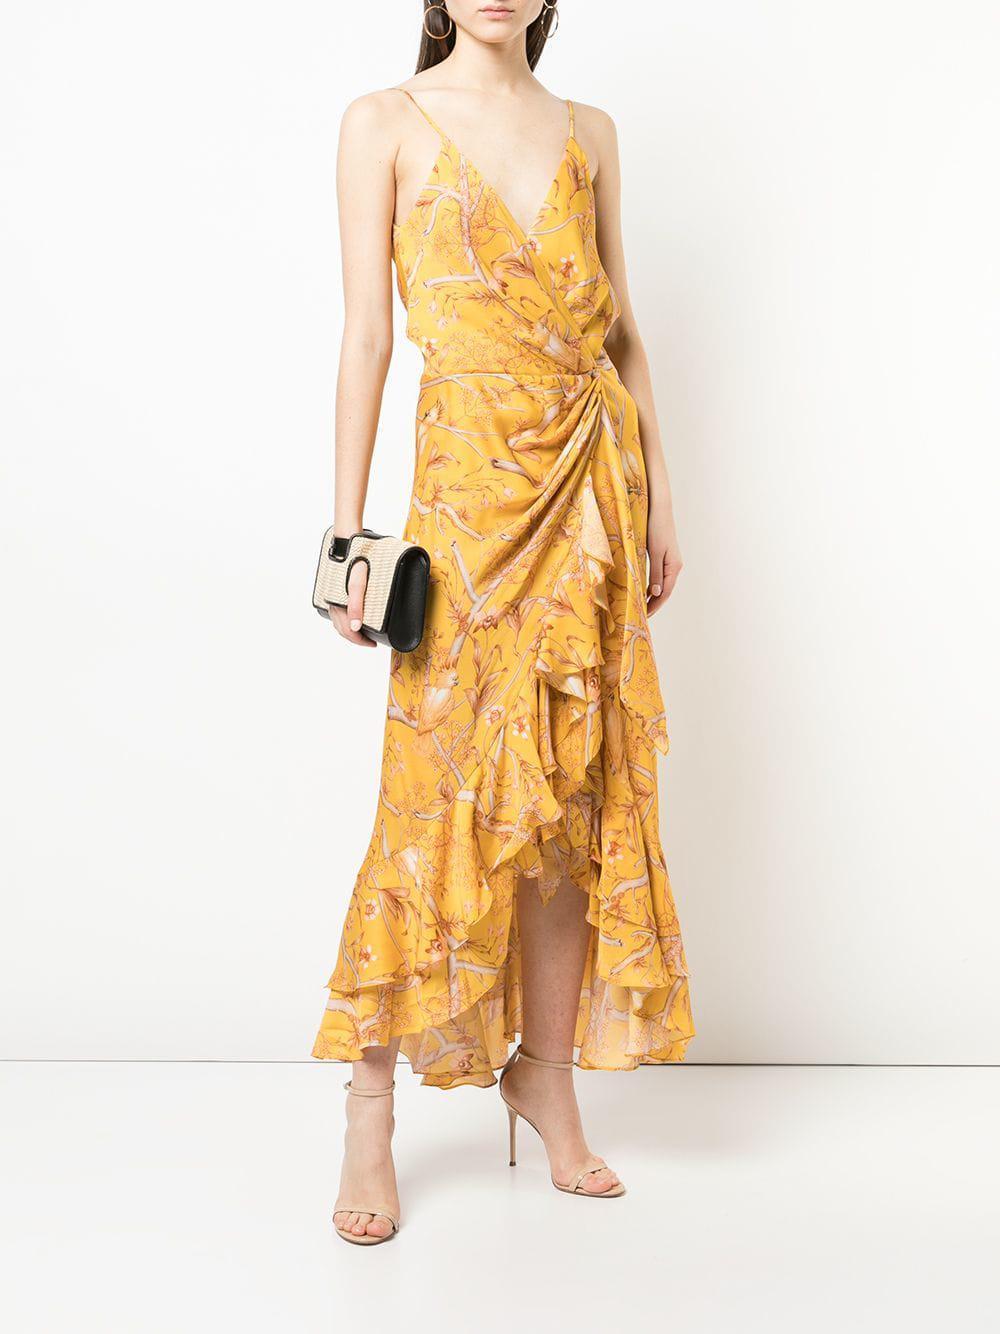 0fe8e30de92 Lyst - Johanna Ortiz Floral Print Ruffle Dress in Yellow